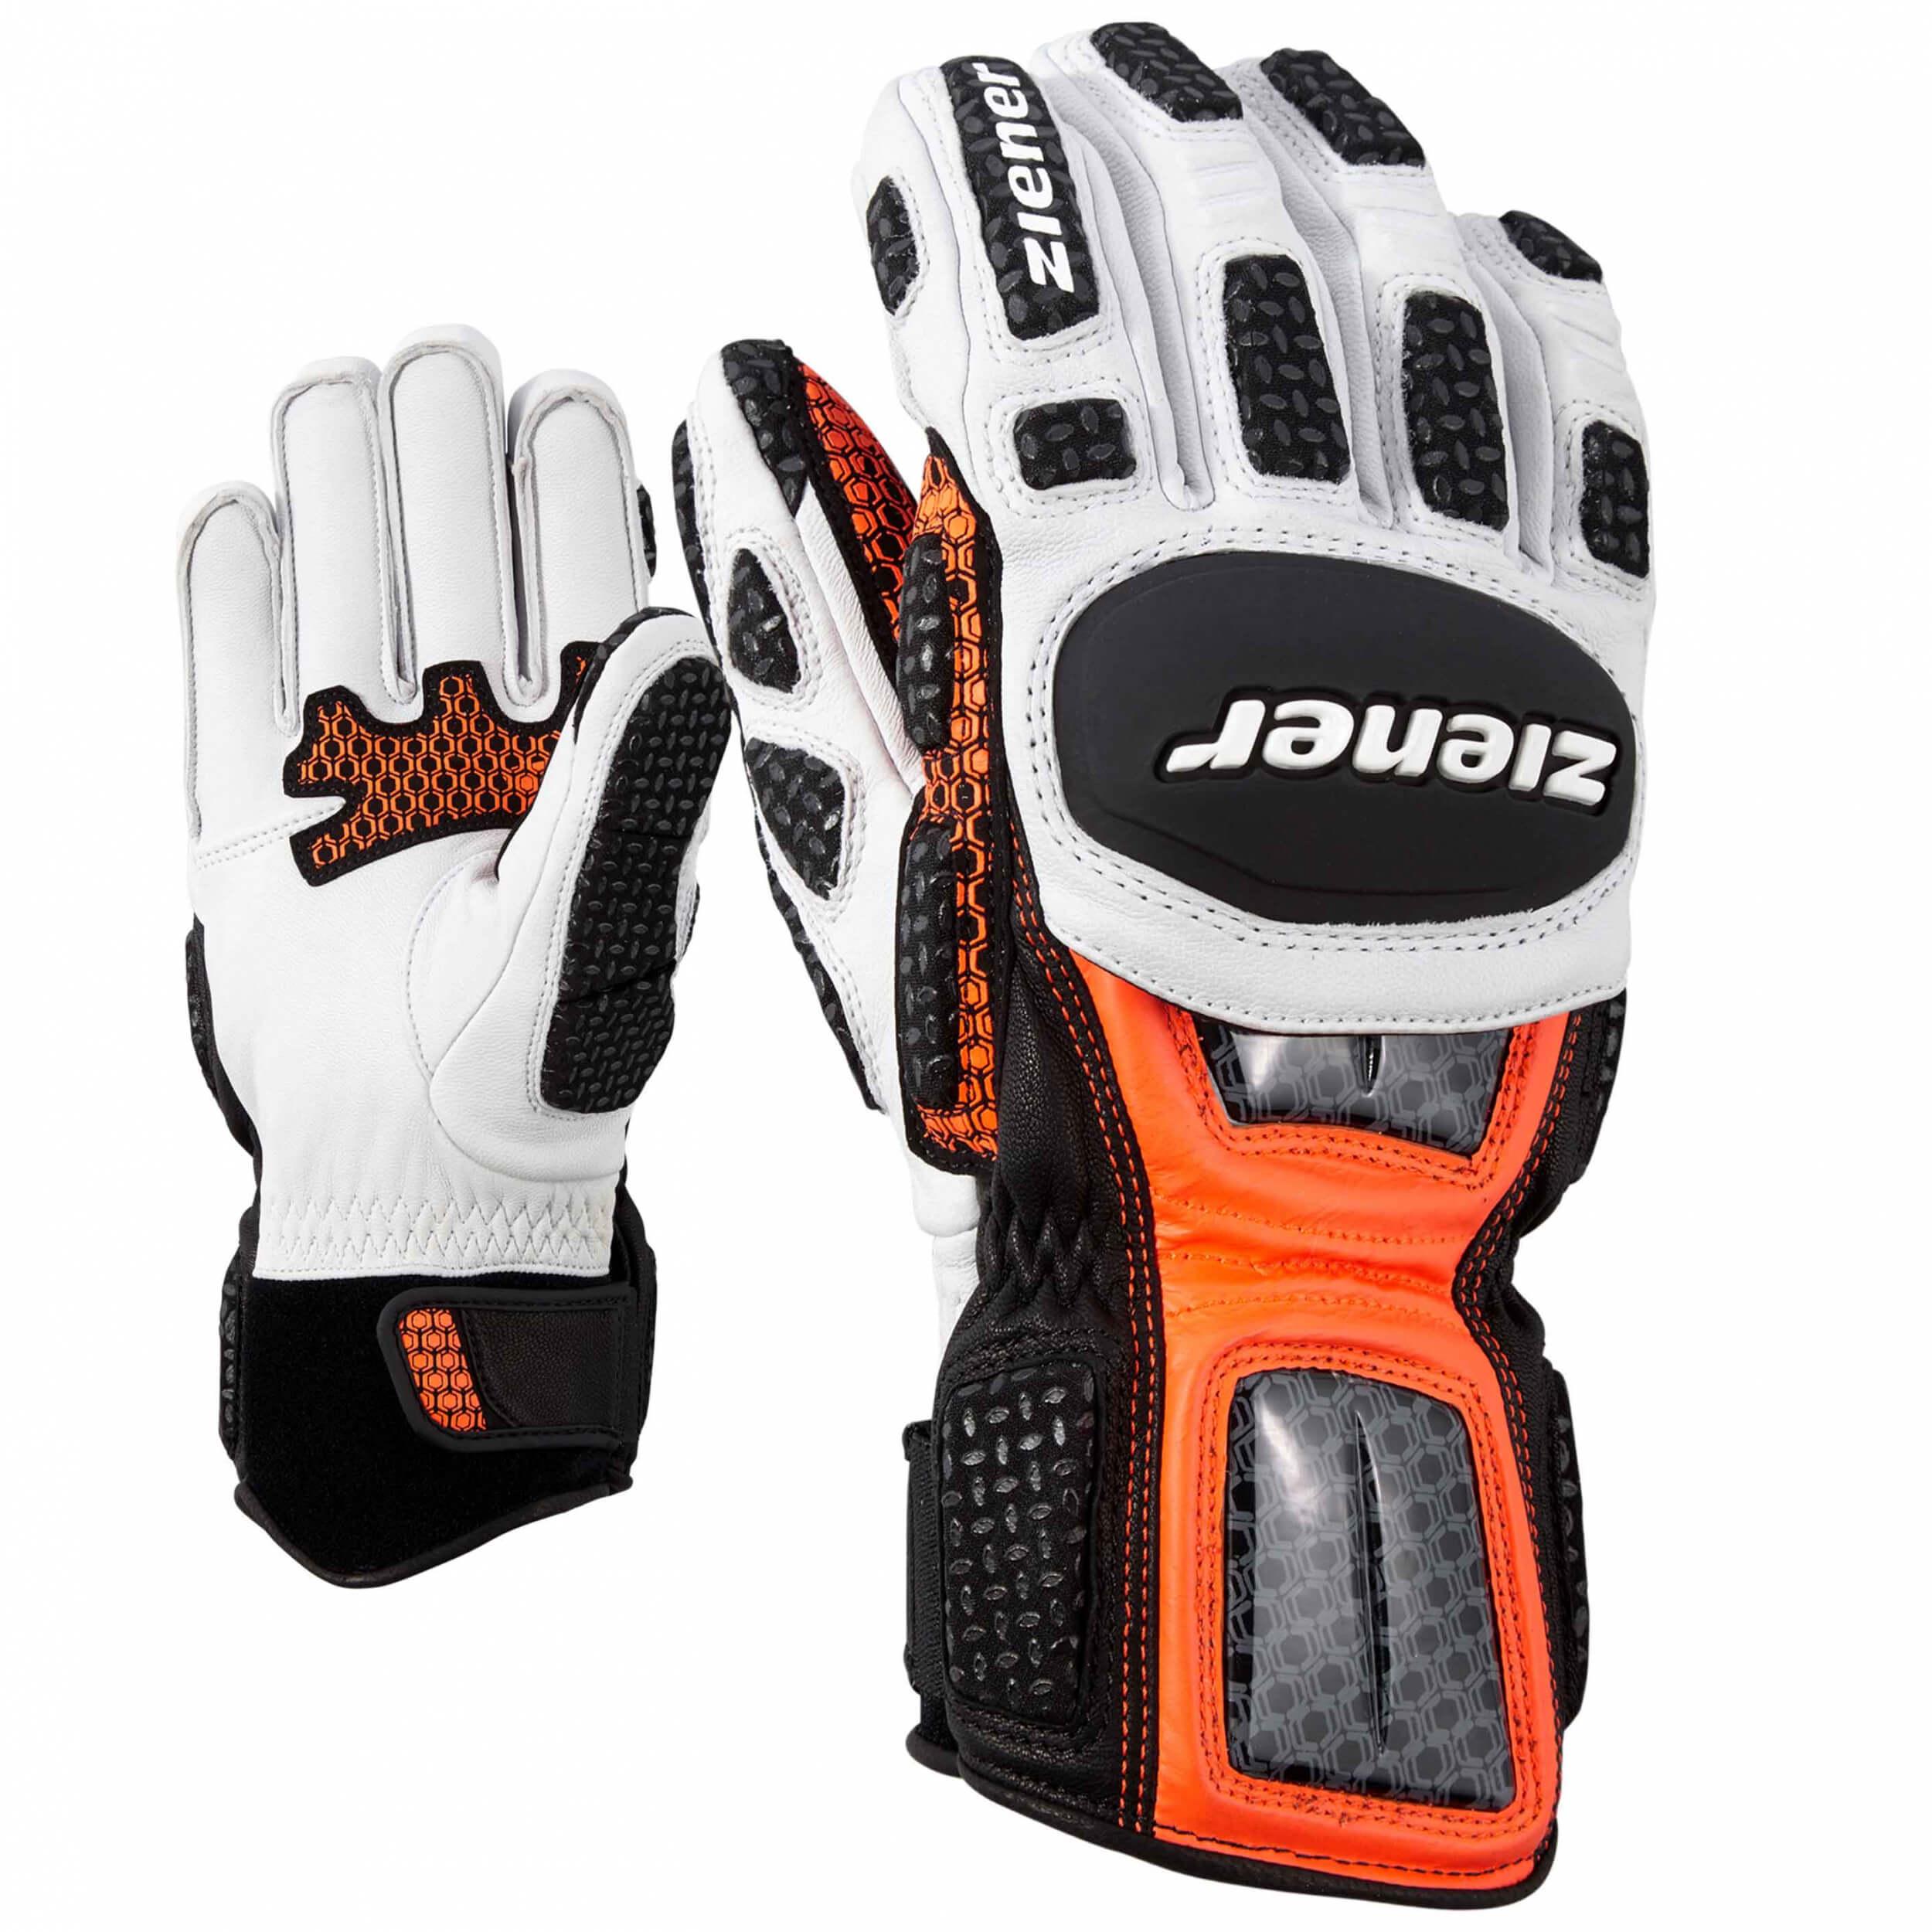 ZIENER Ski Race Handschuhe Giant Slalom orange 738